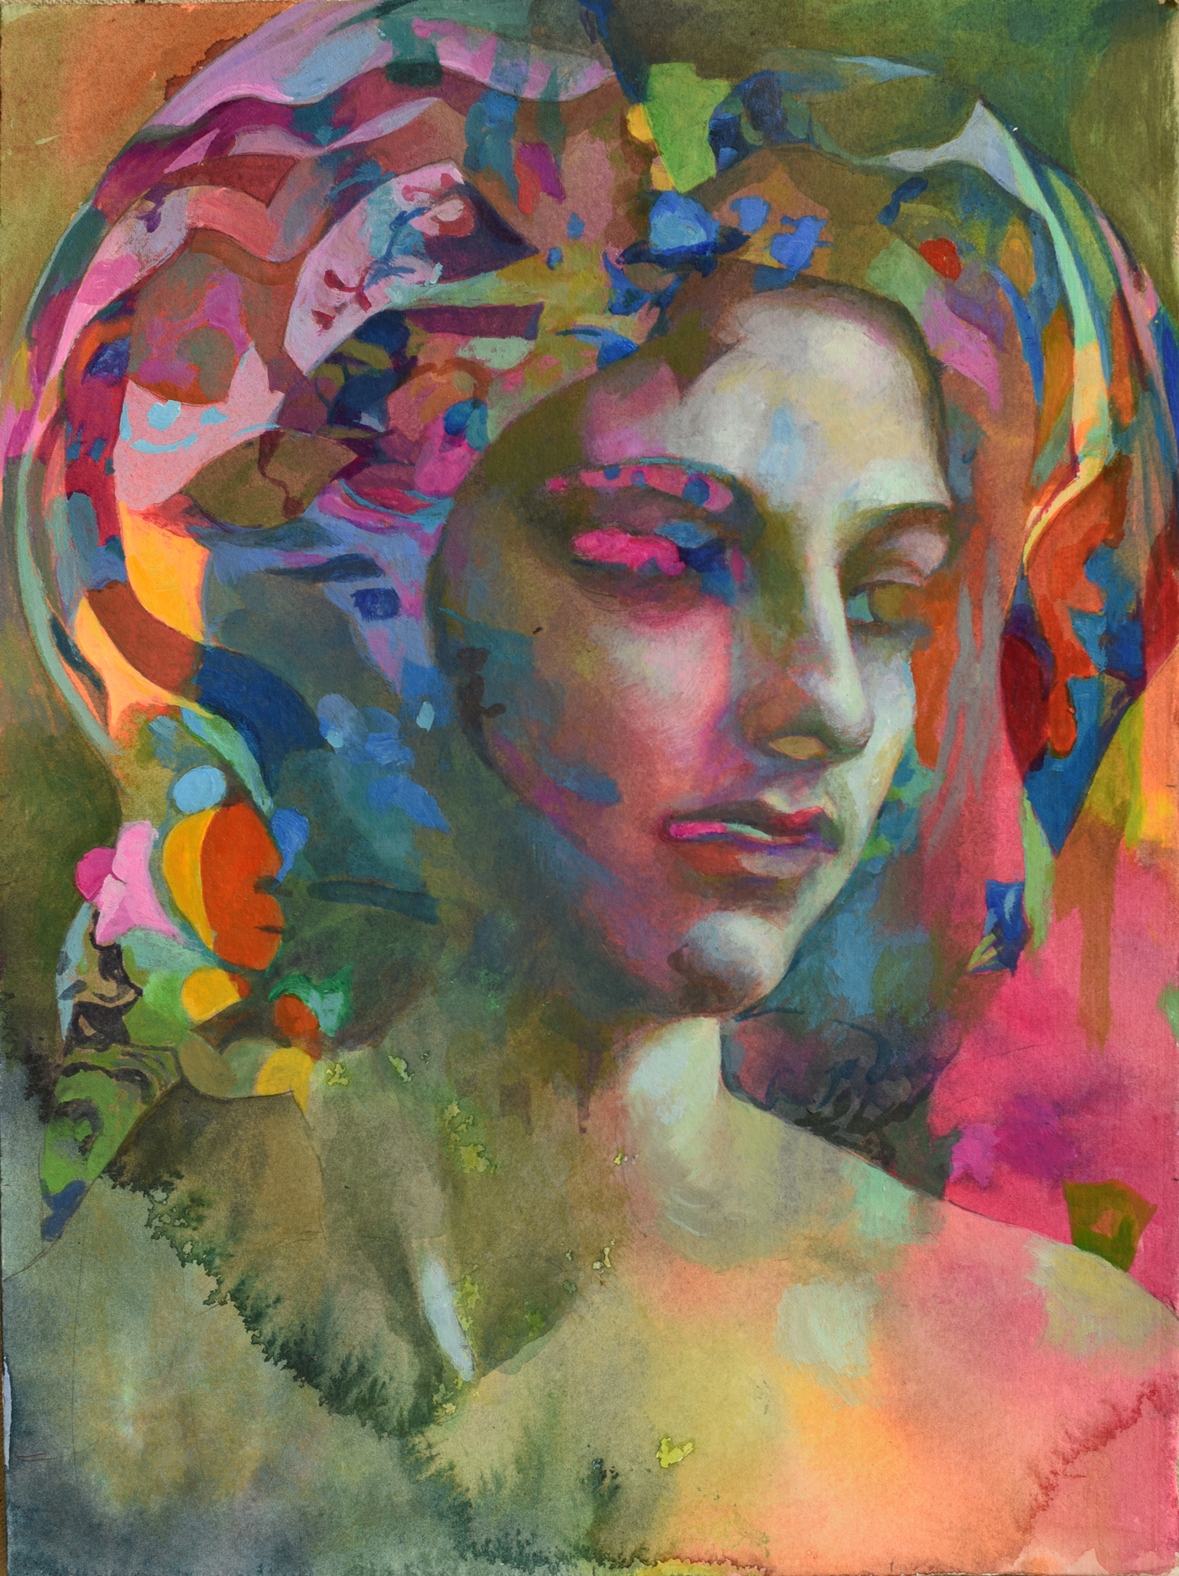 """Medusa"" 15"" x 11"" watercolor/acrylic on paper"